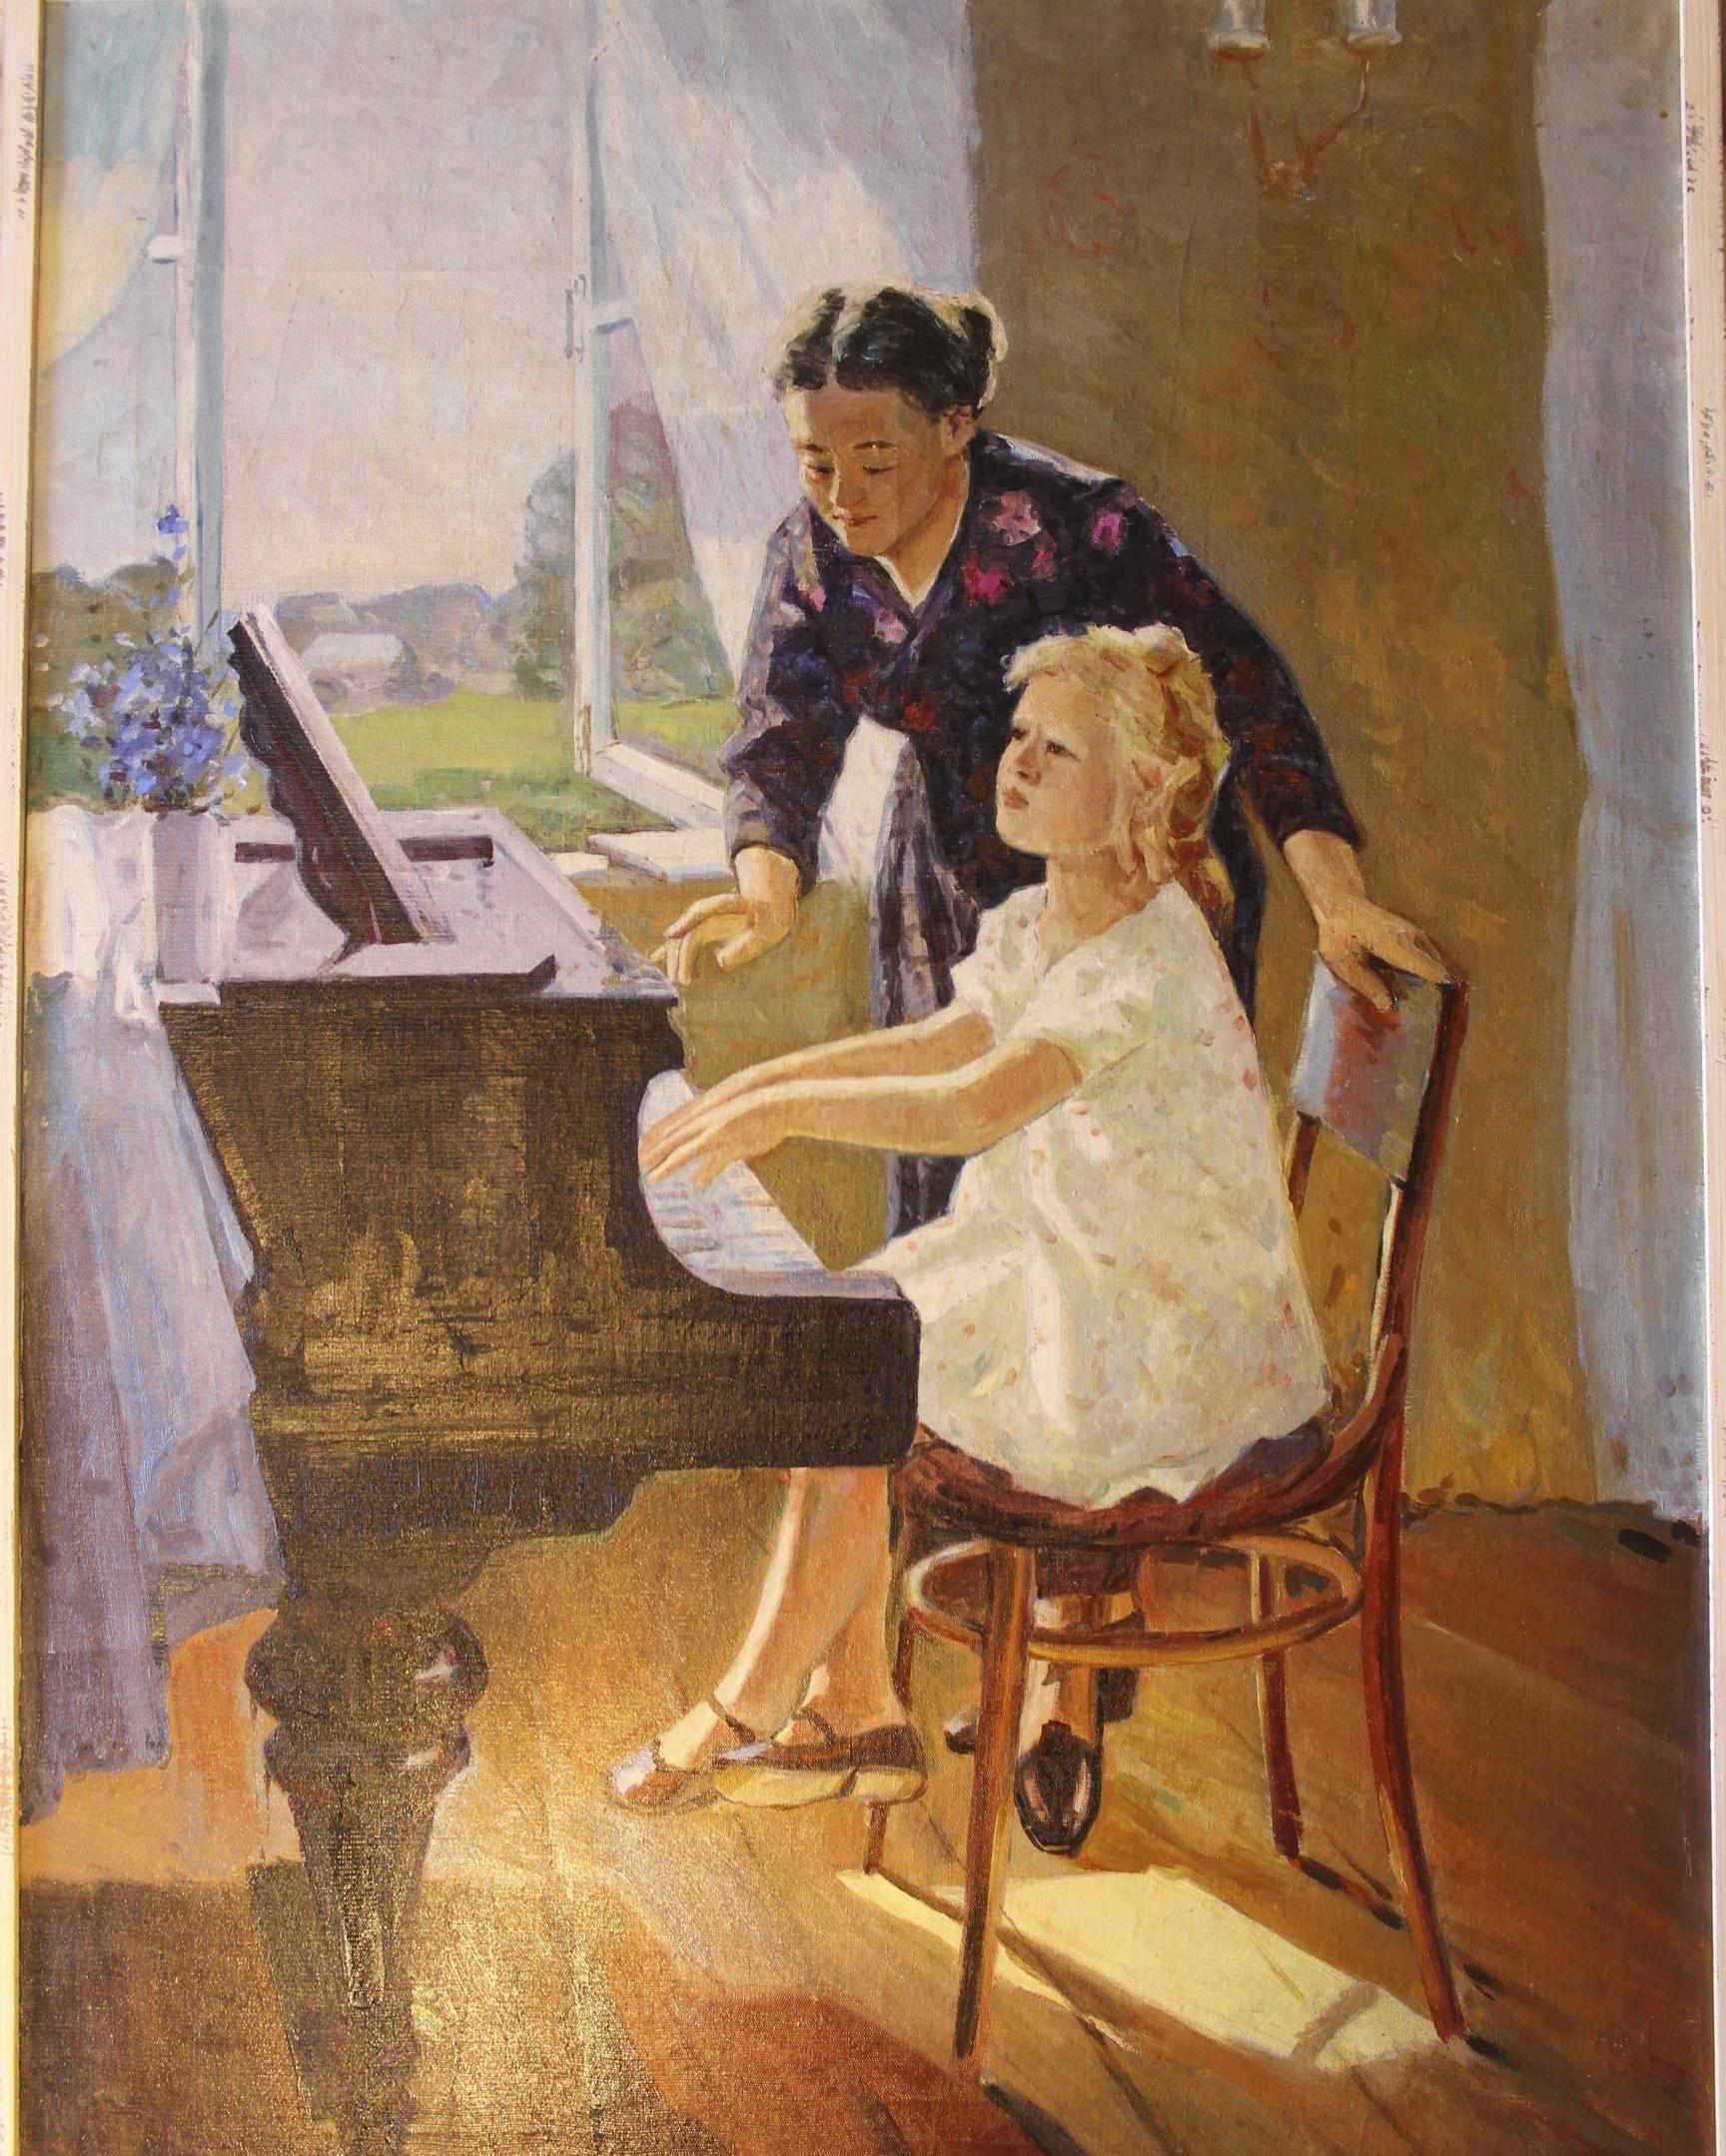 """Music Lesson / Урок музыки"",1970. Александр Наседкин (Alexander Nasedkin)."